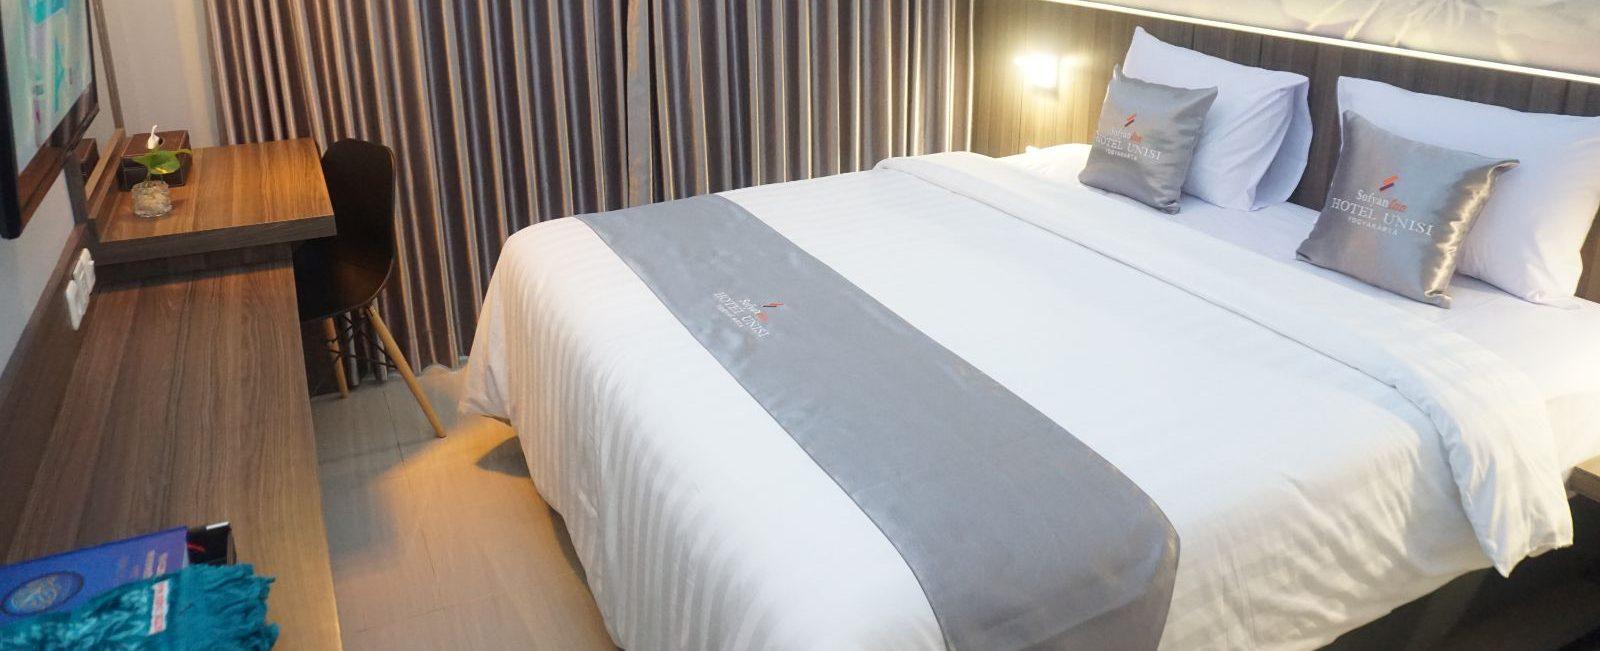 Sofyan Inn Hotel Unisi